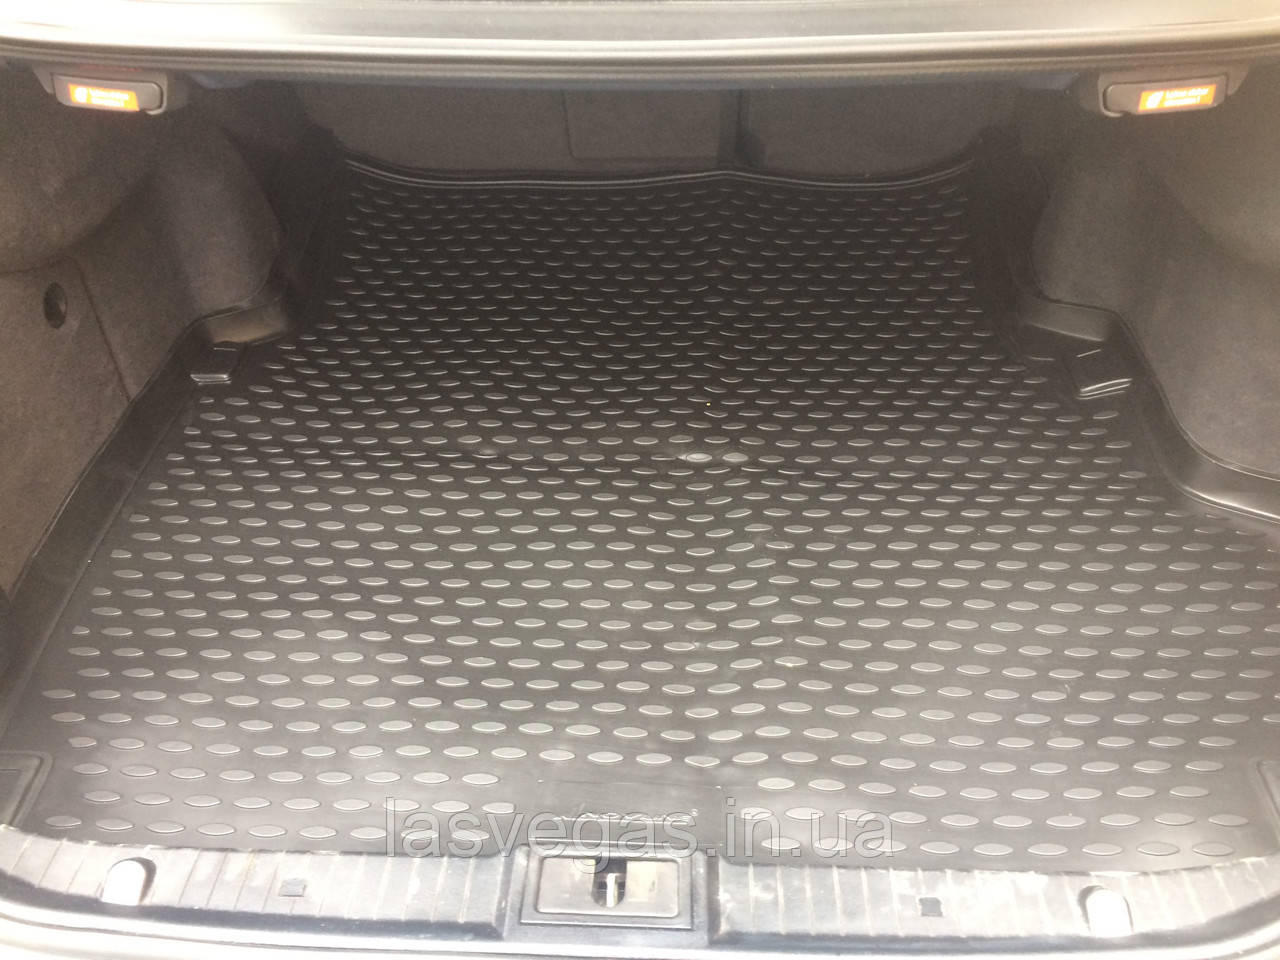 Коврик в багажник  MERCEDES-BENZ E-class W211 2002-2009 сед. (полиуретан)